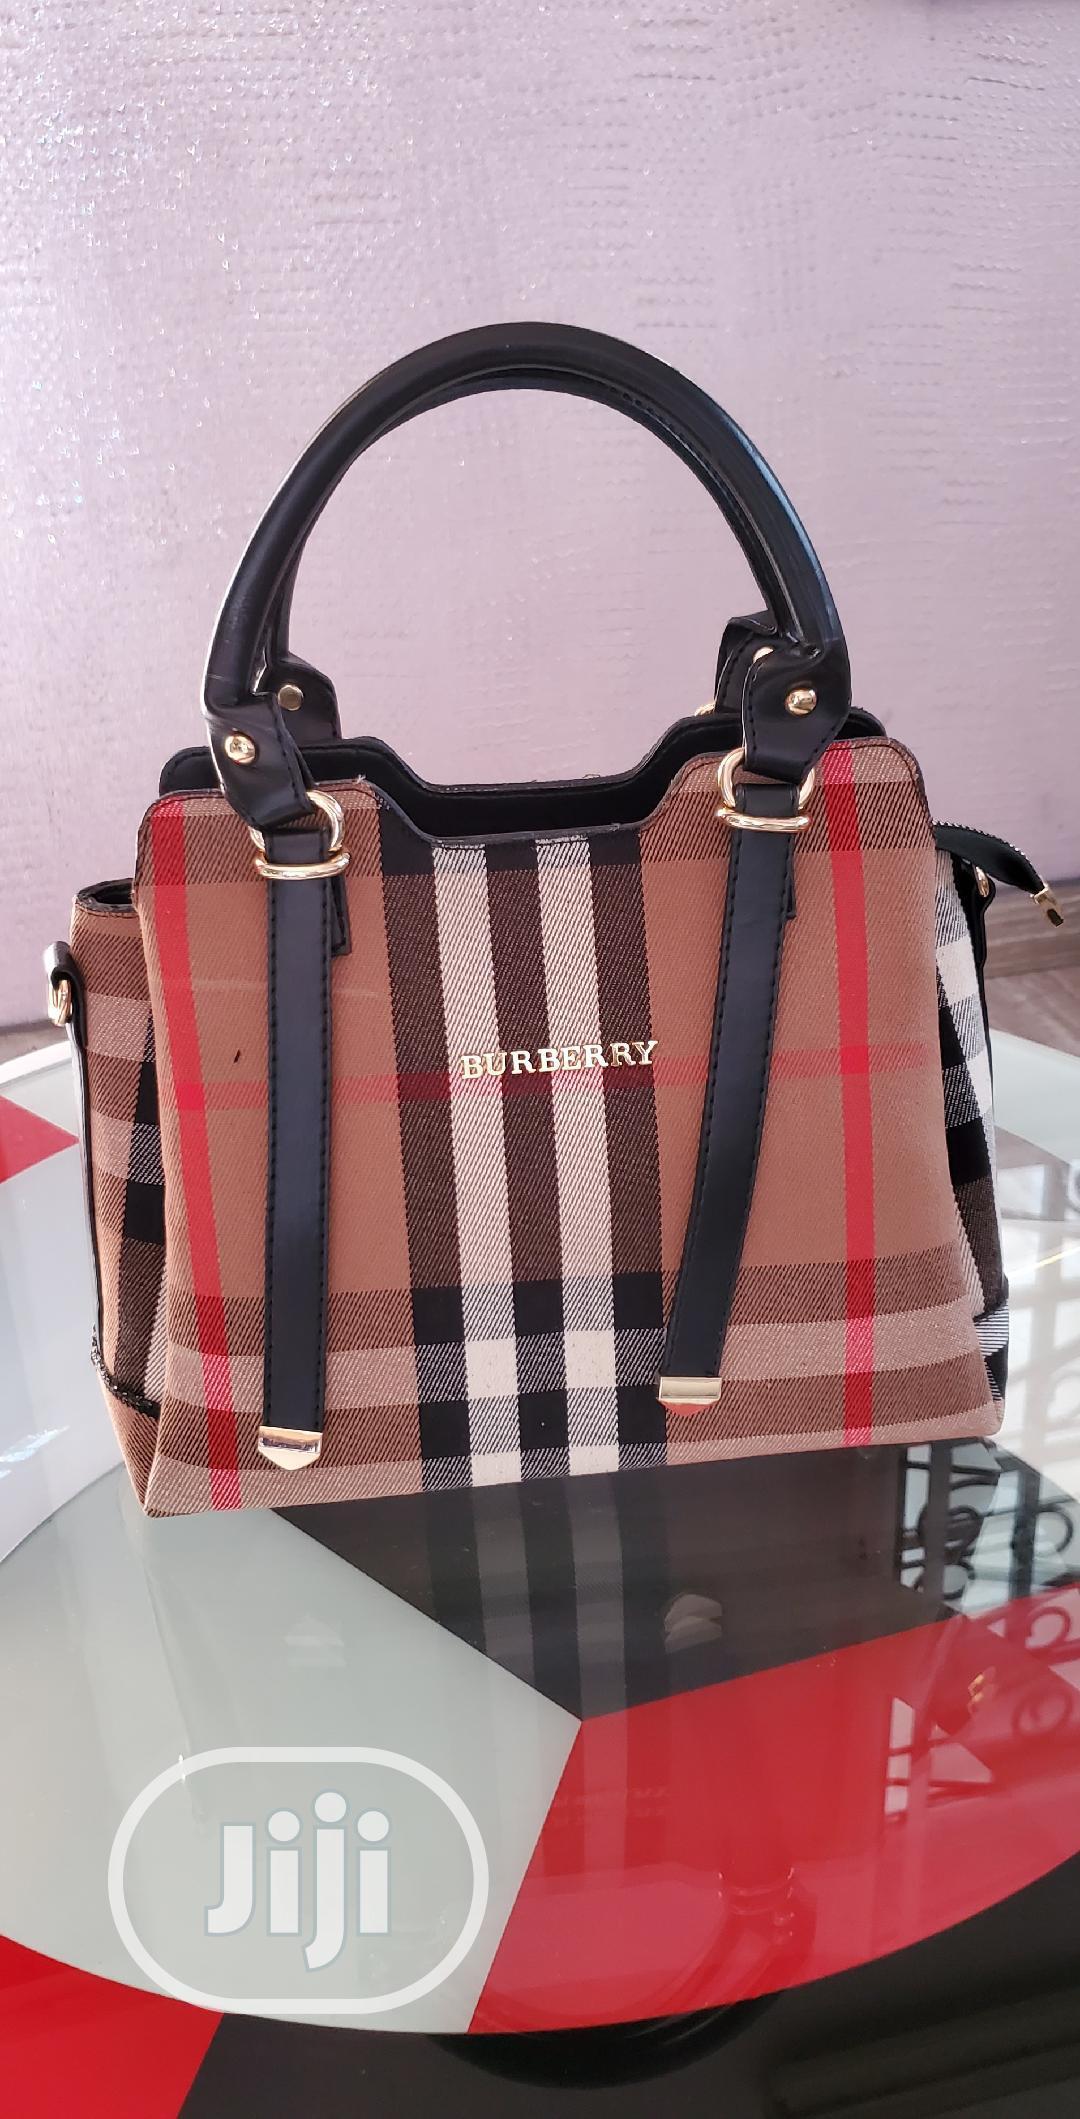 Burberry Women Handbag